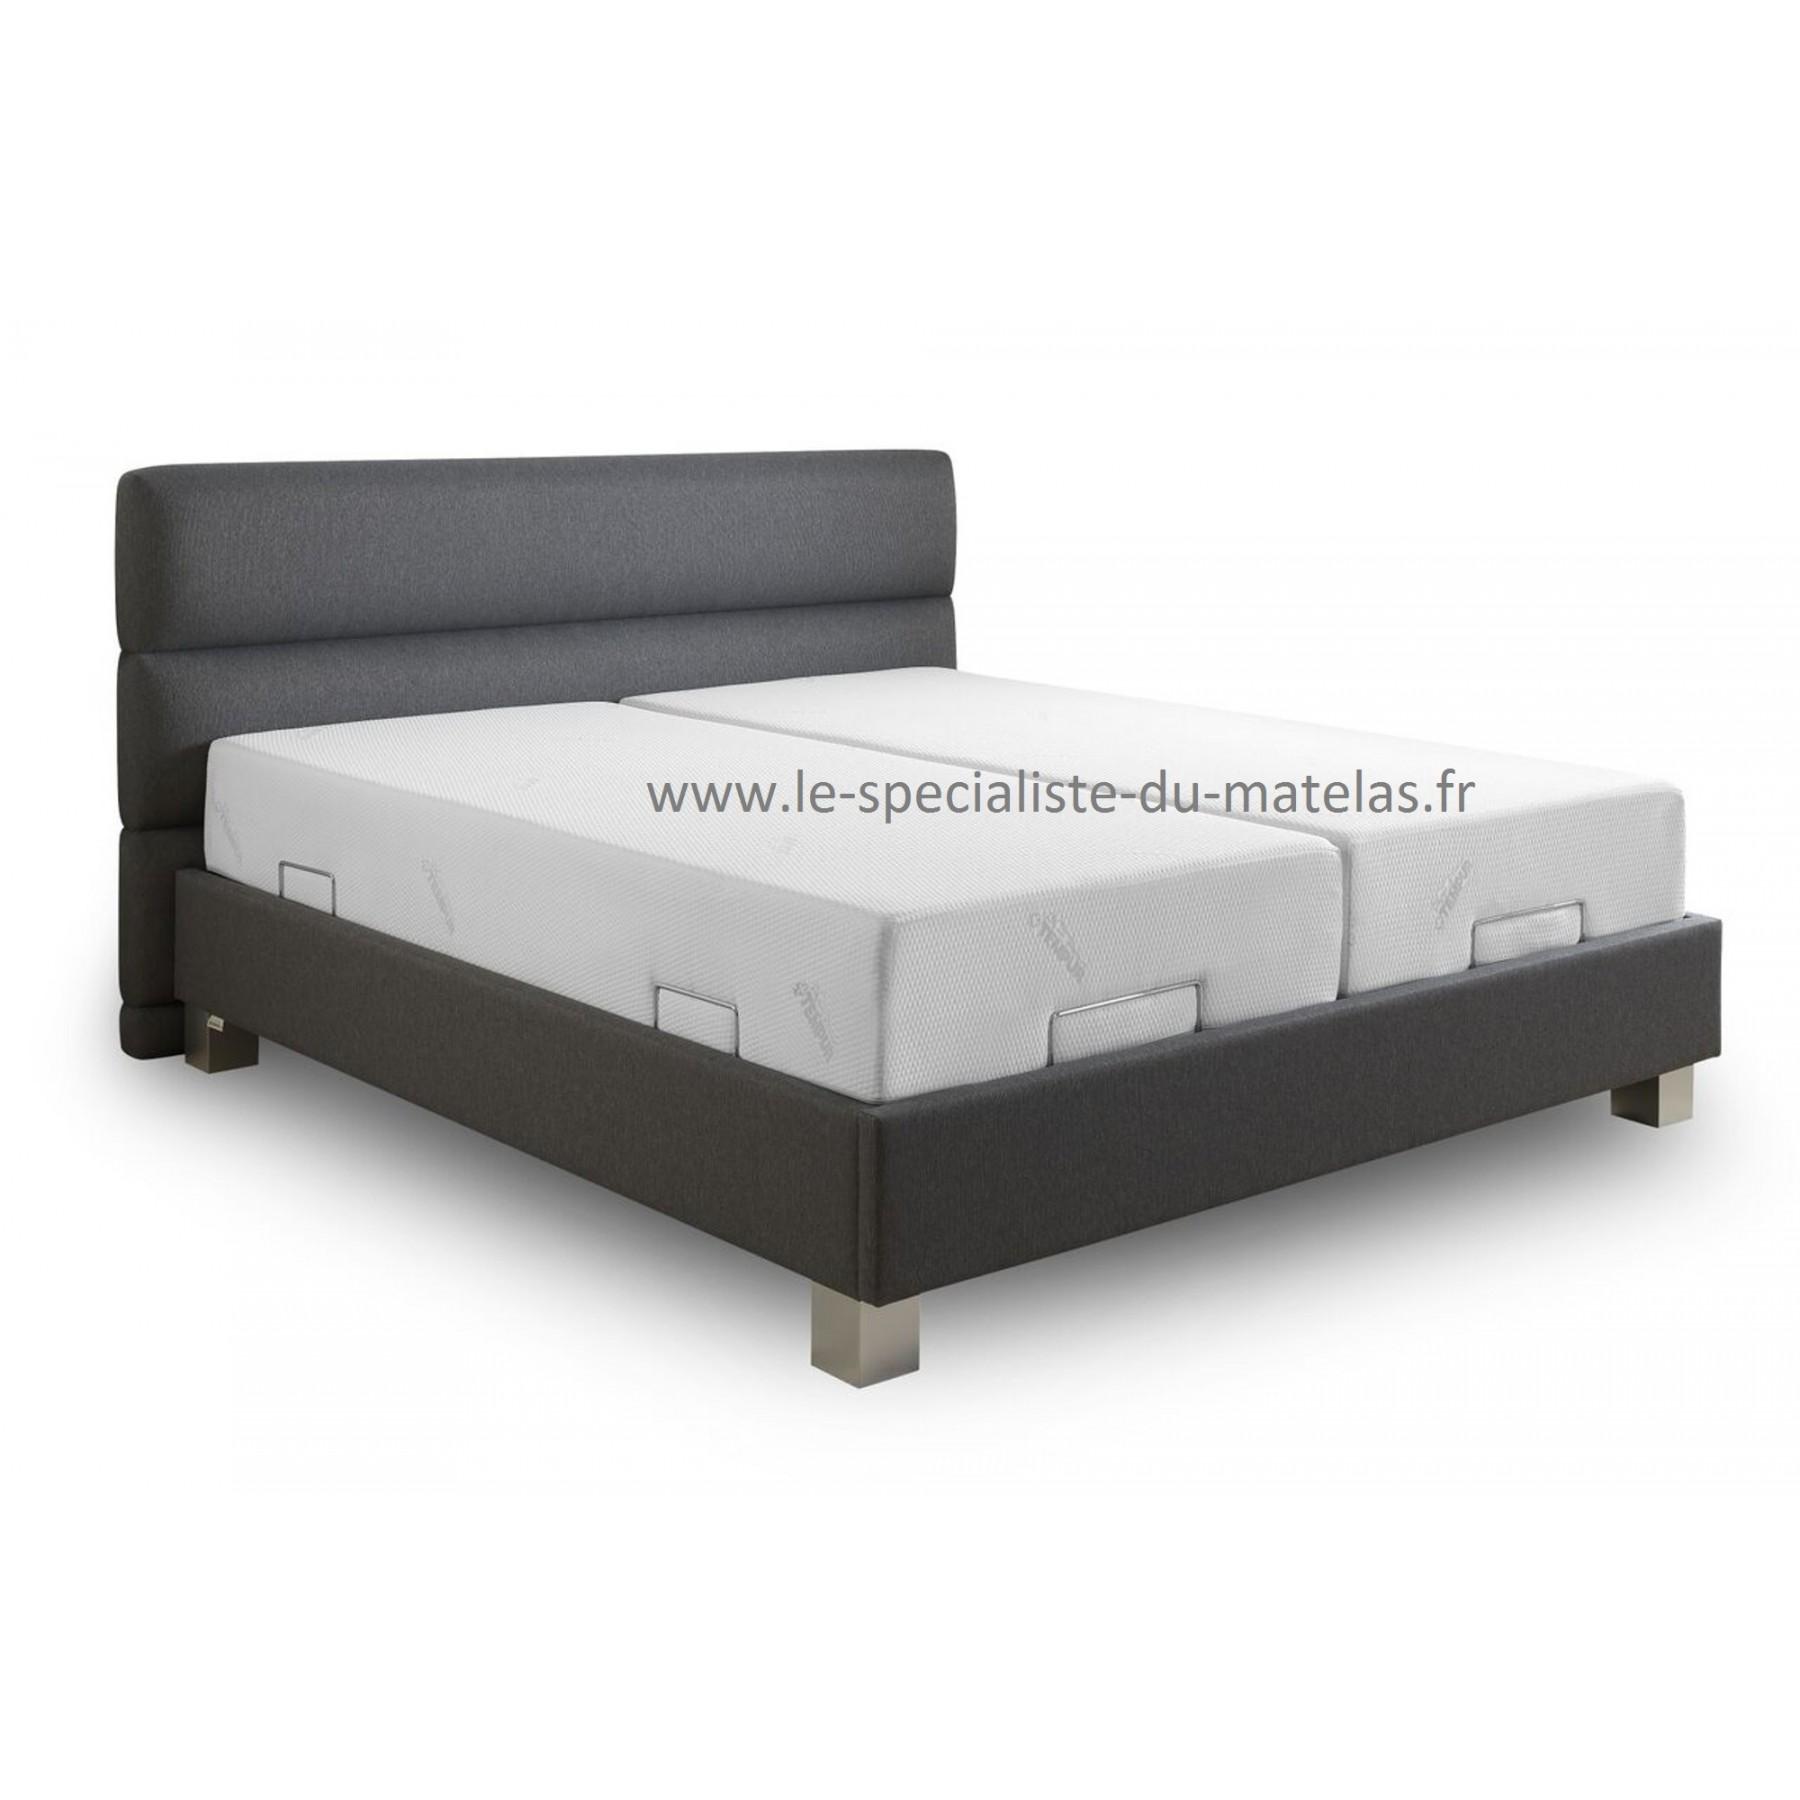 matelas tempur cloud. Black Bedroom Furniture Sets. Home Design Ideas